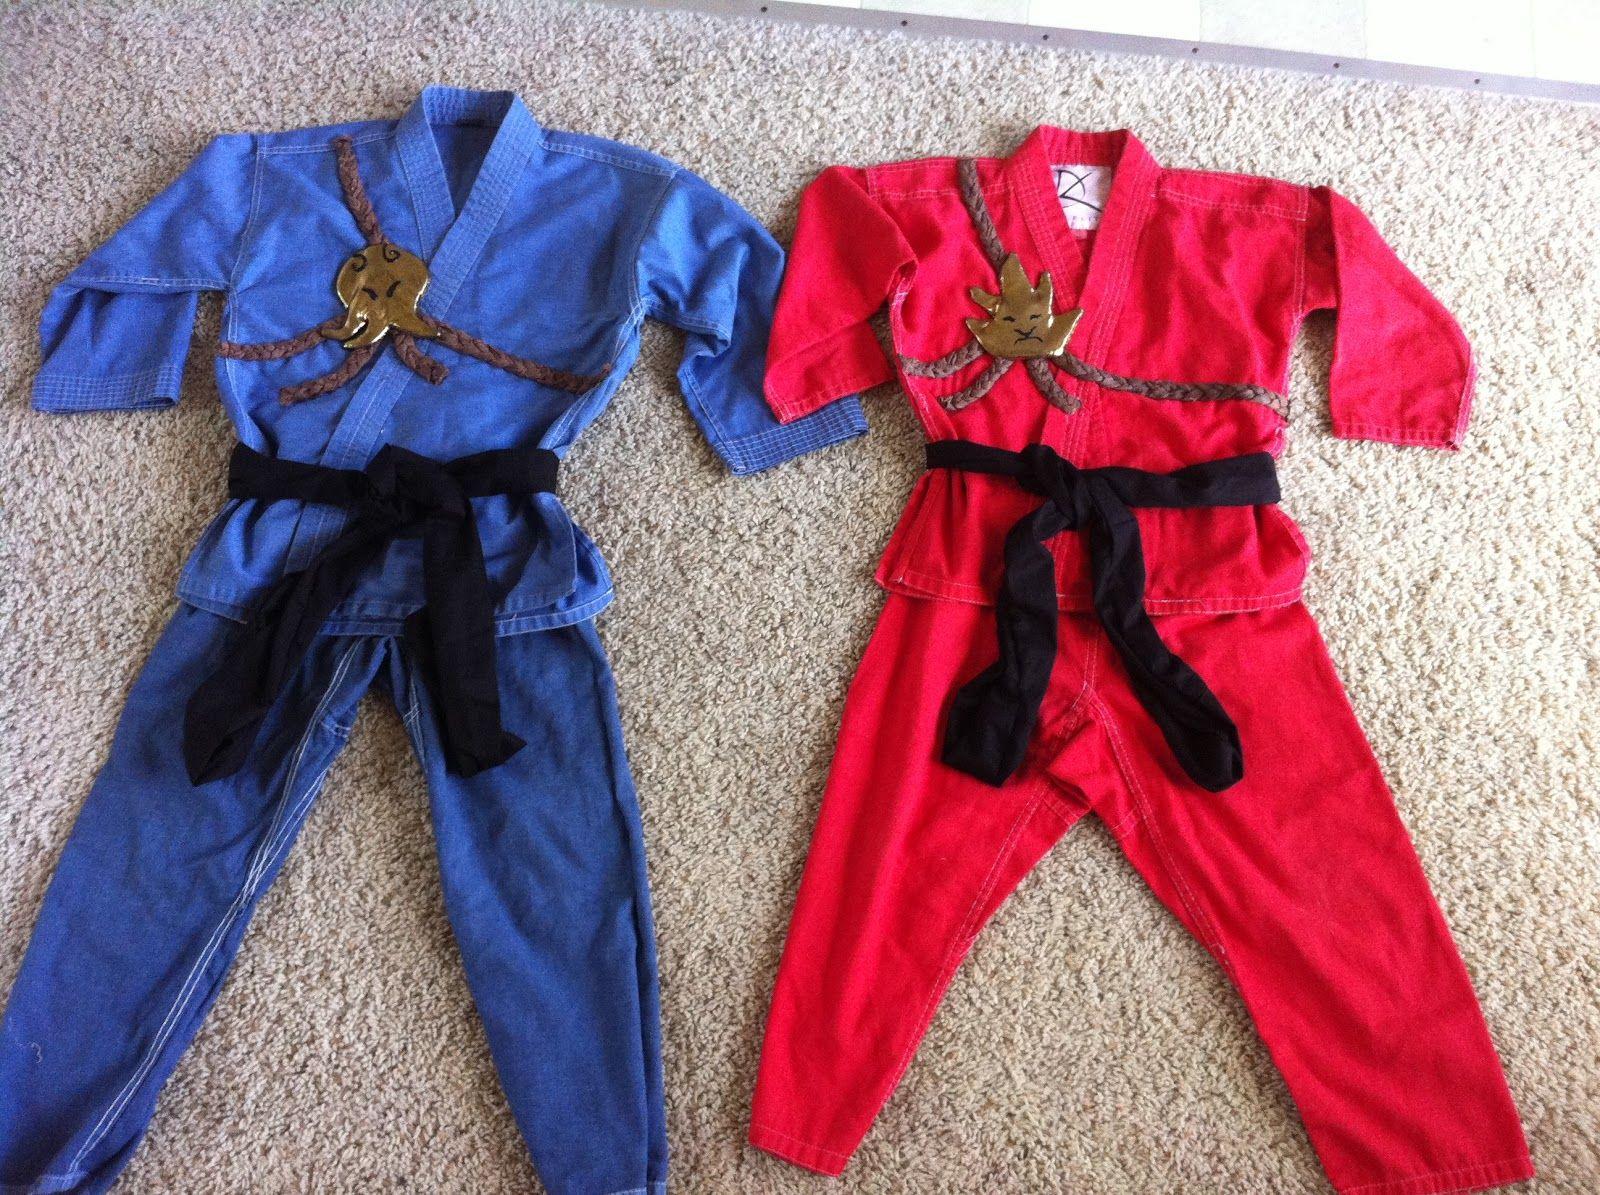 ninjago costume google search kost me und verkleiden. Black Bedroom Furniture Sets. Home Design Ideas